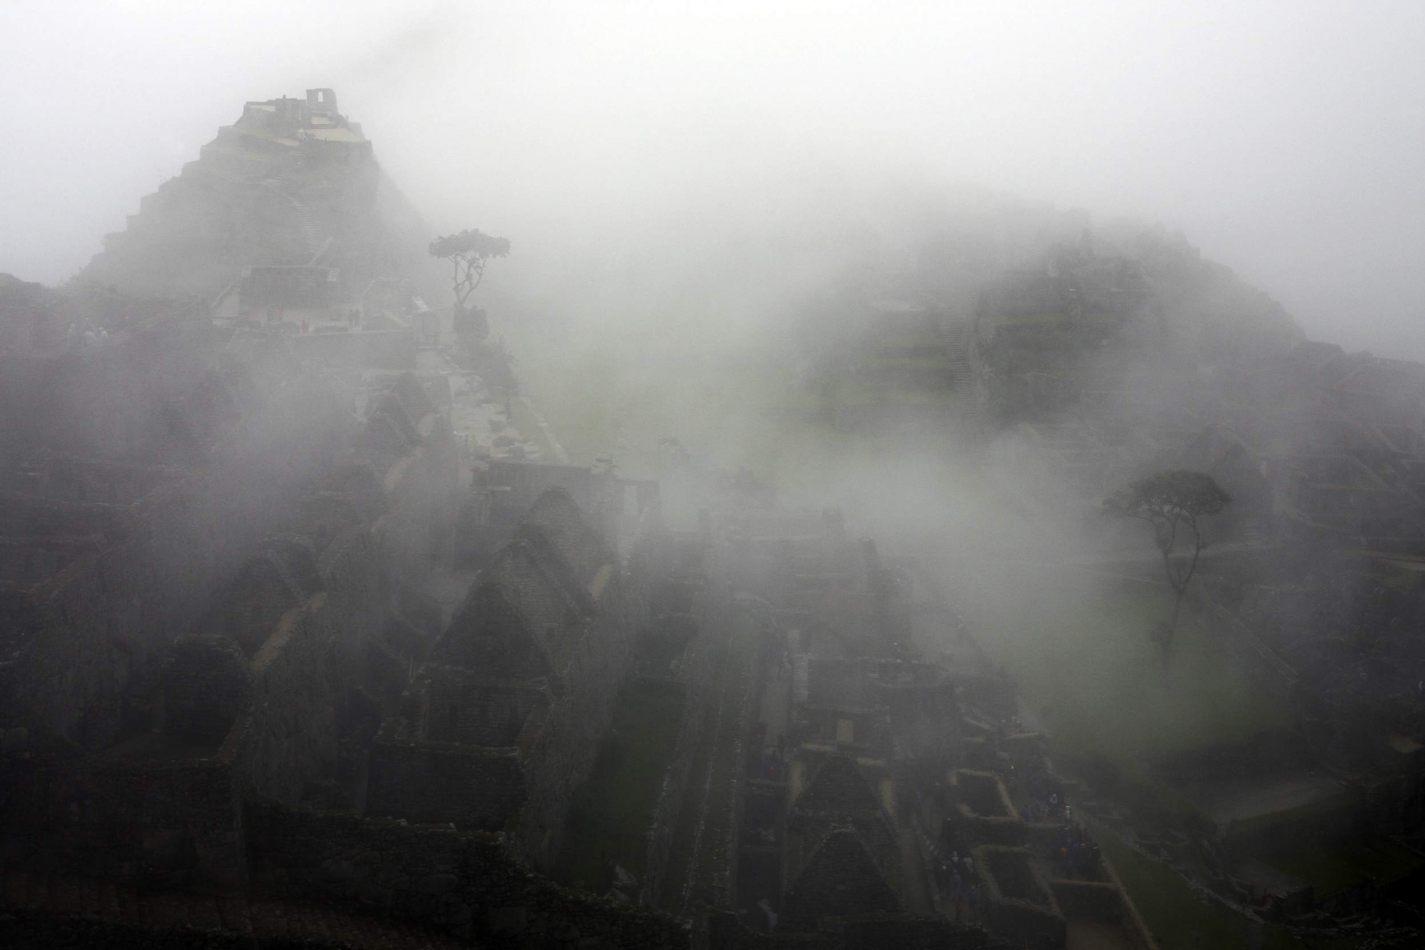 Anthony Ellis Photography: Apus - City of Mist